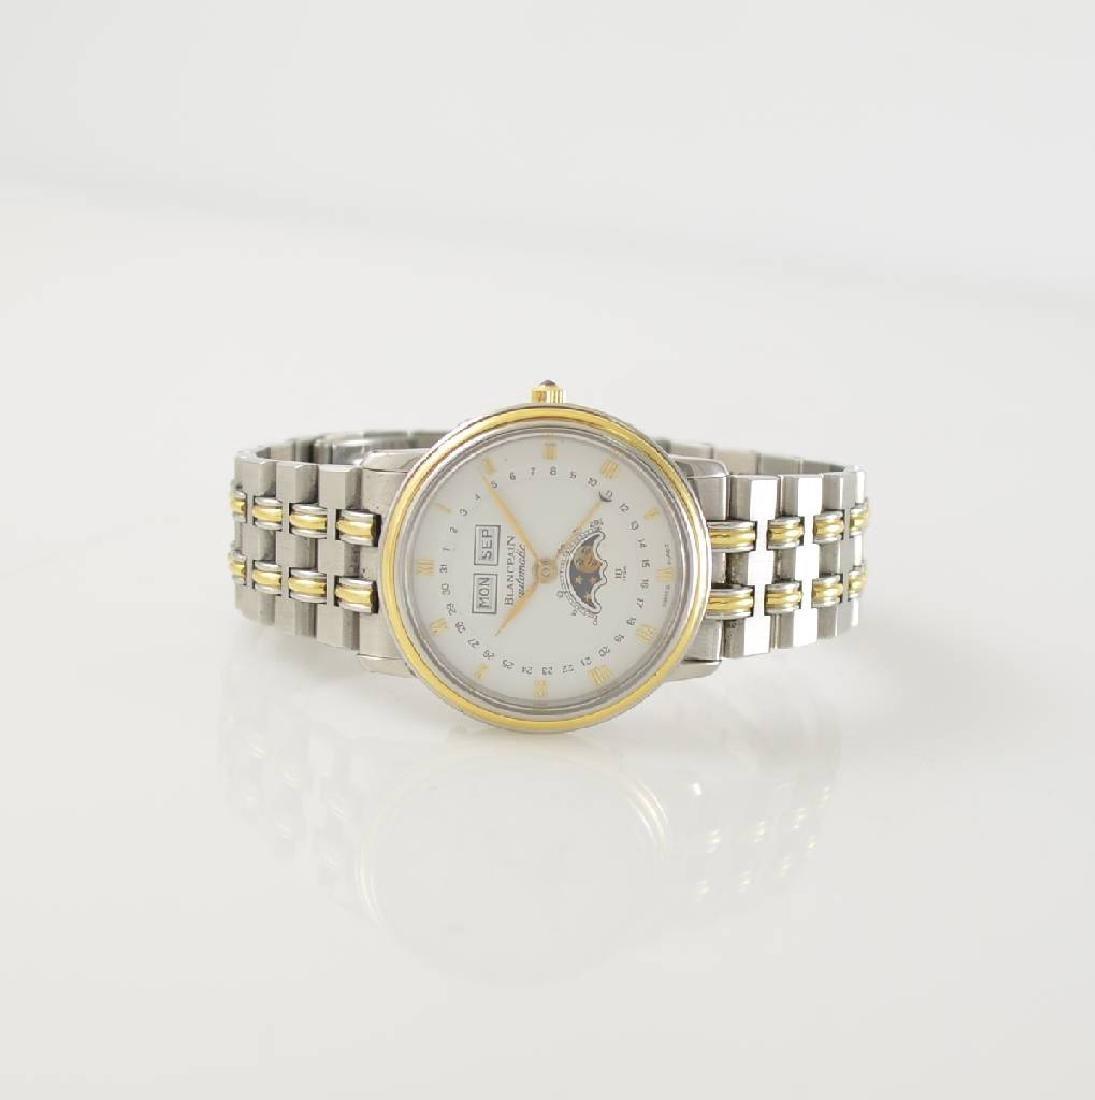 BLANCPAIN astronomical gents wristwatch